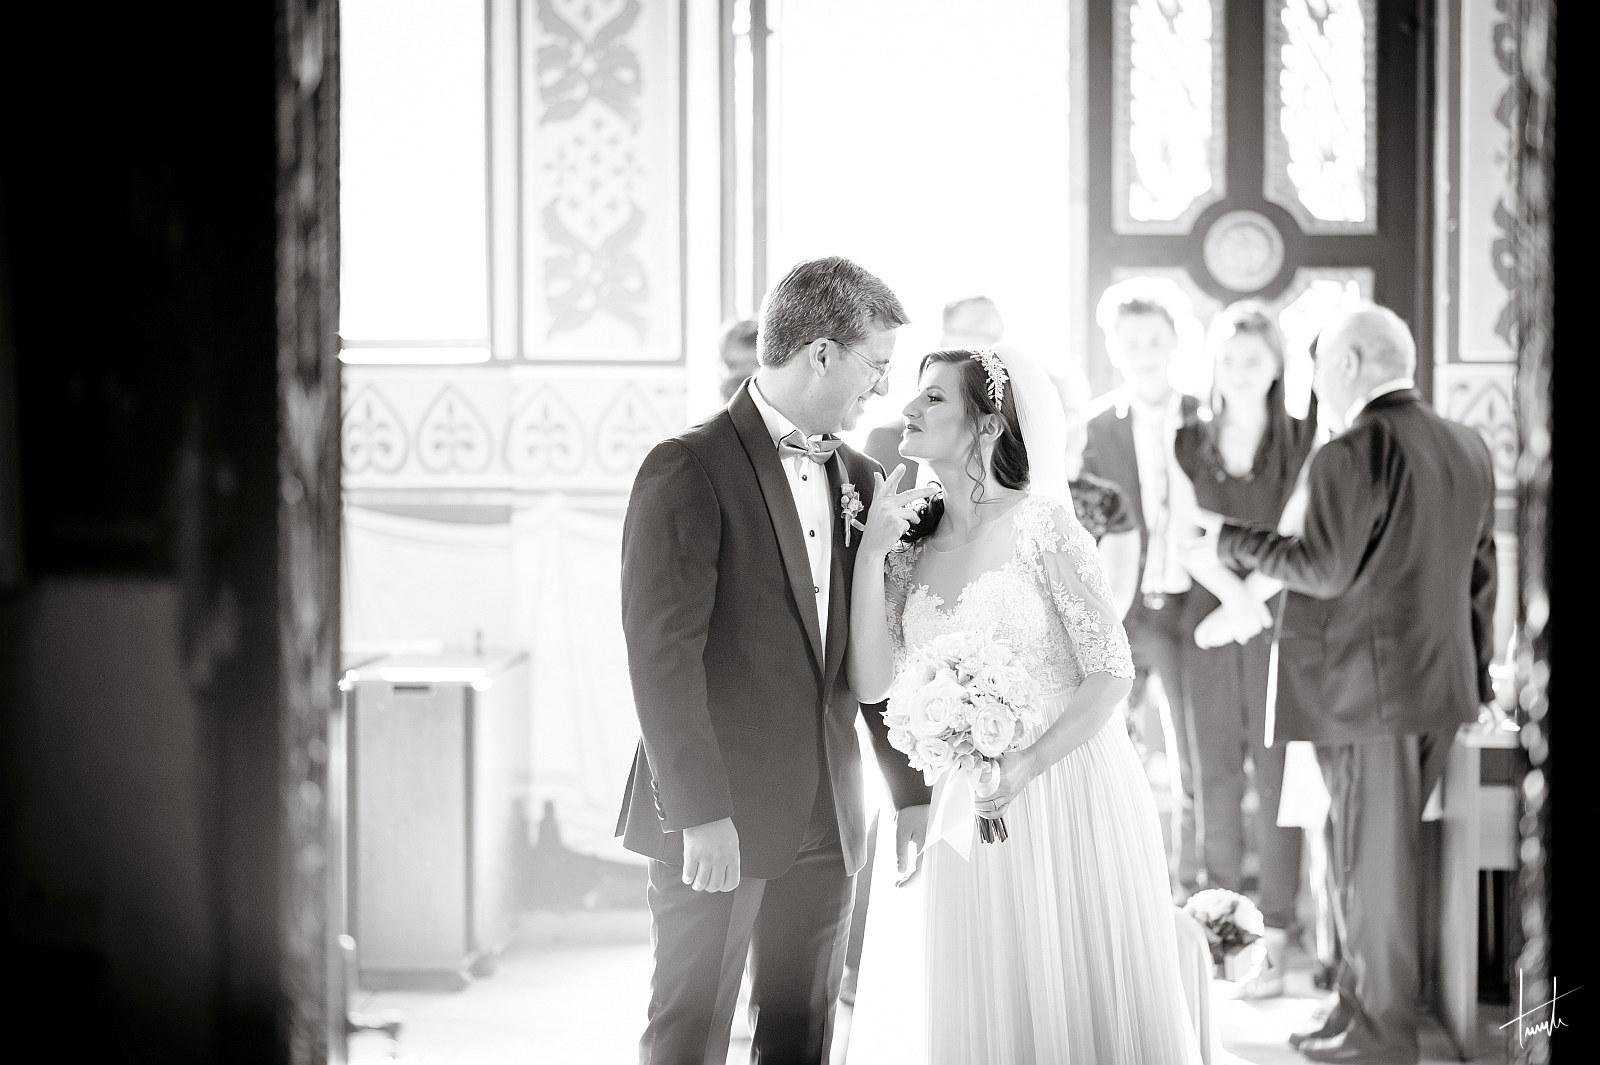 fotograf nunta - Bogdan Terente - Diana Cosmin 05